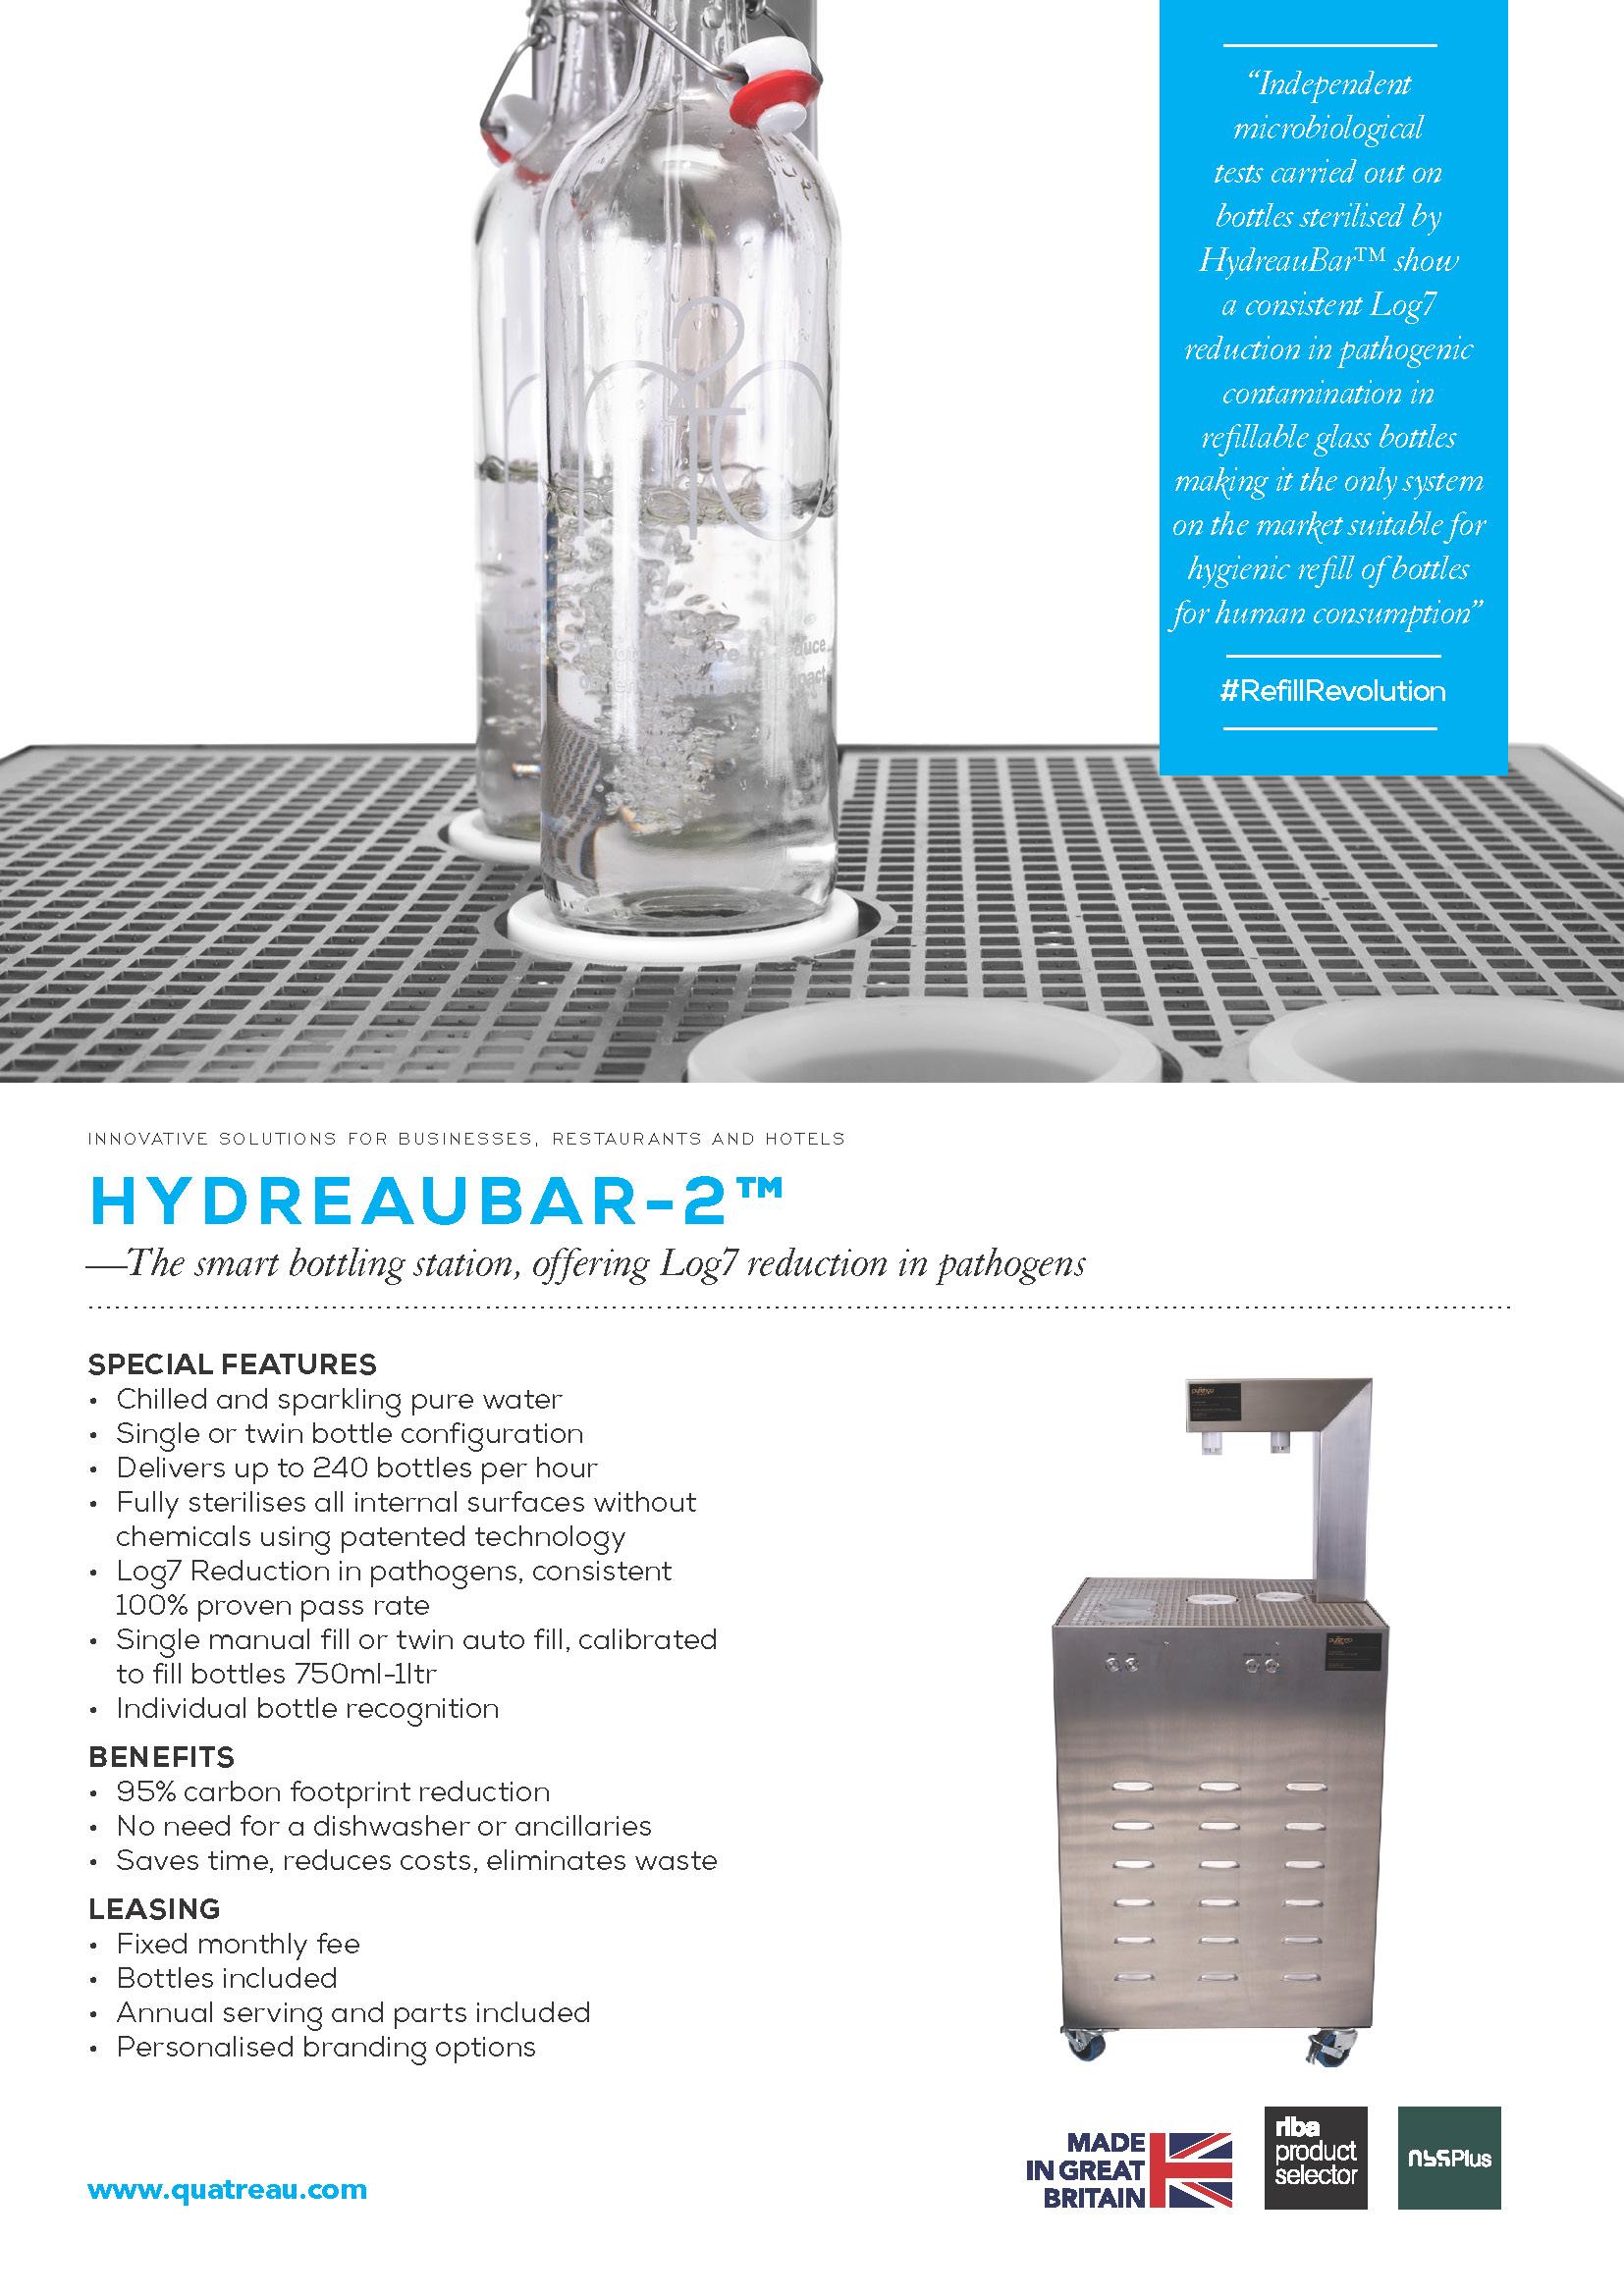 Quatreau-HydreauBar-HB-2-TechnicalSpec-50hz